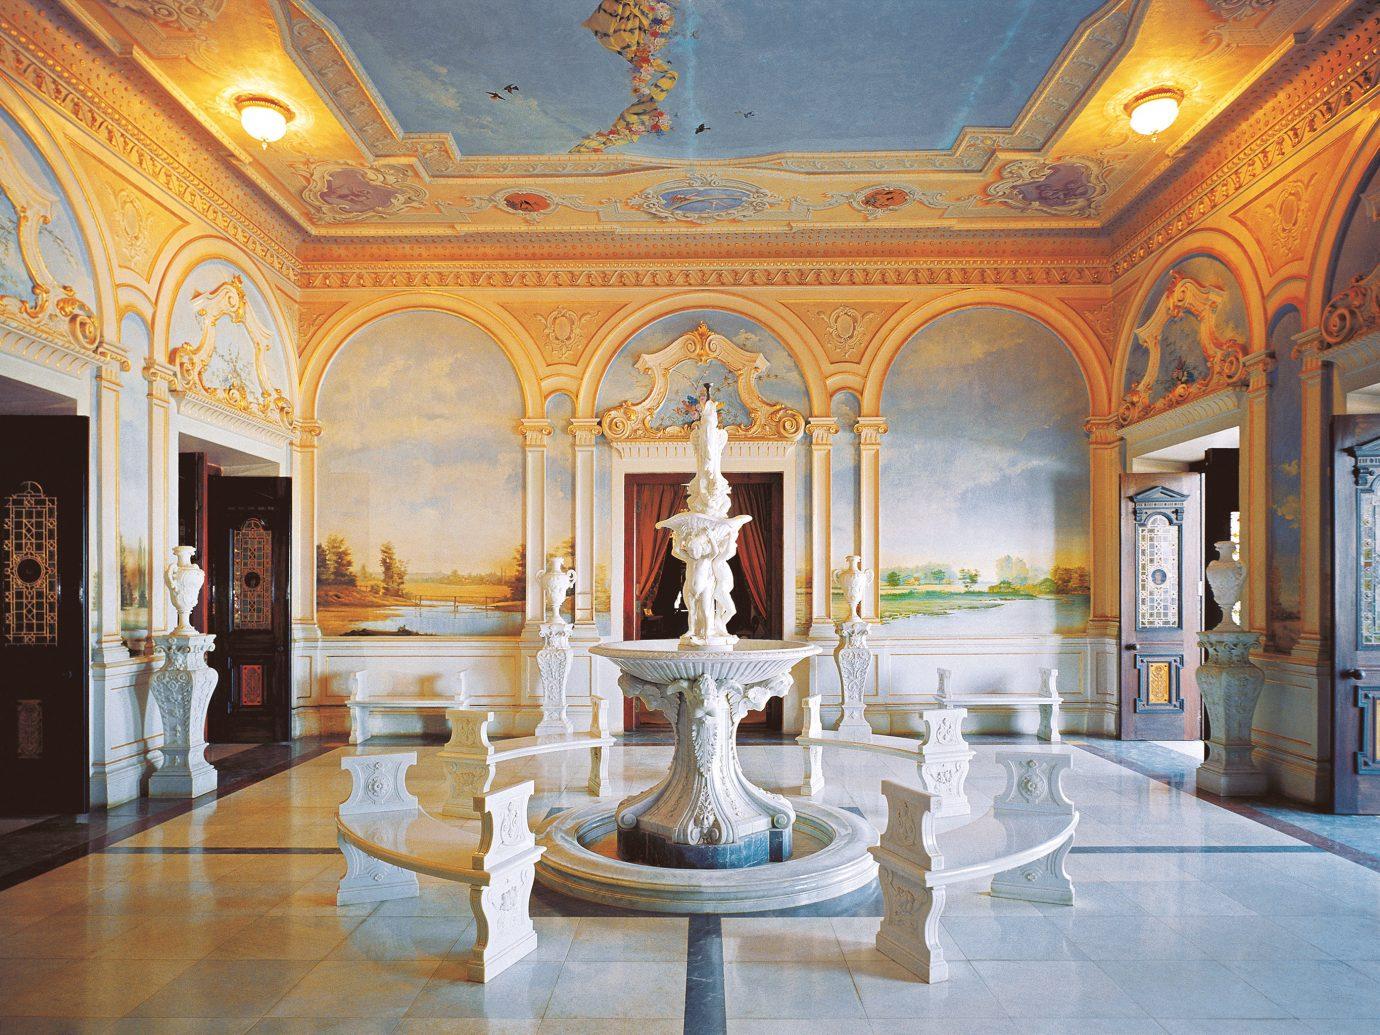 Design Elegant Hotels Luxury indoor Lobby estate building palace mansion interior design tourist attraction ballroom art gallery colonnade